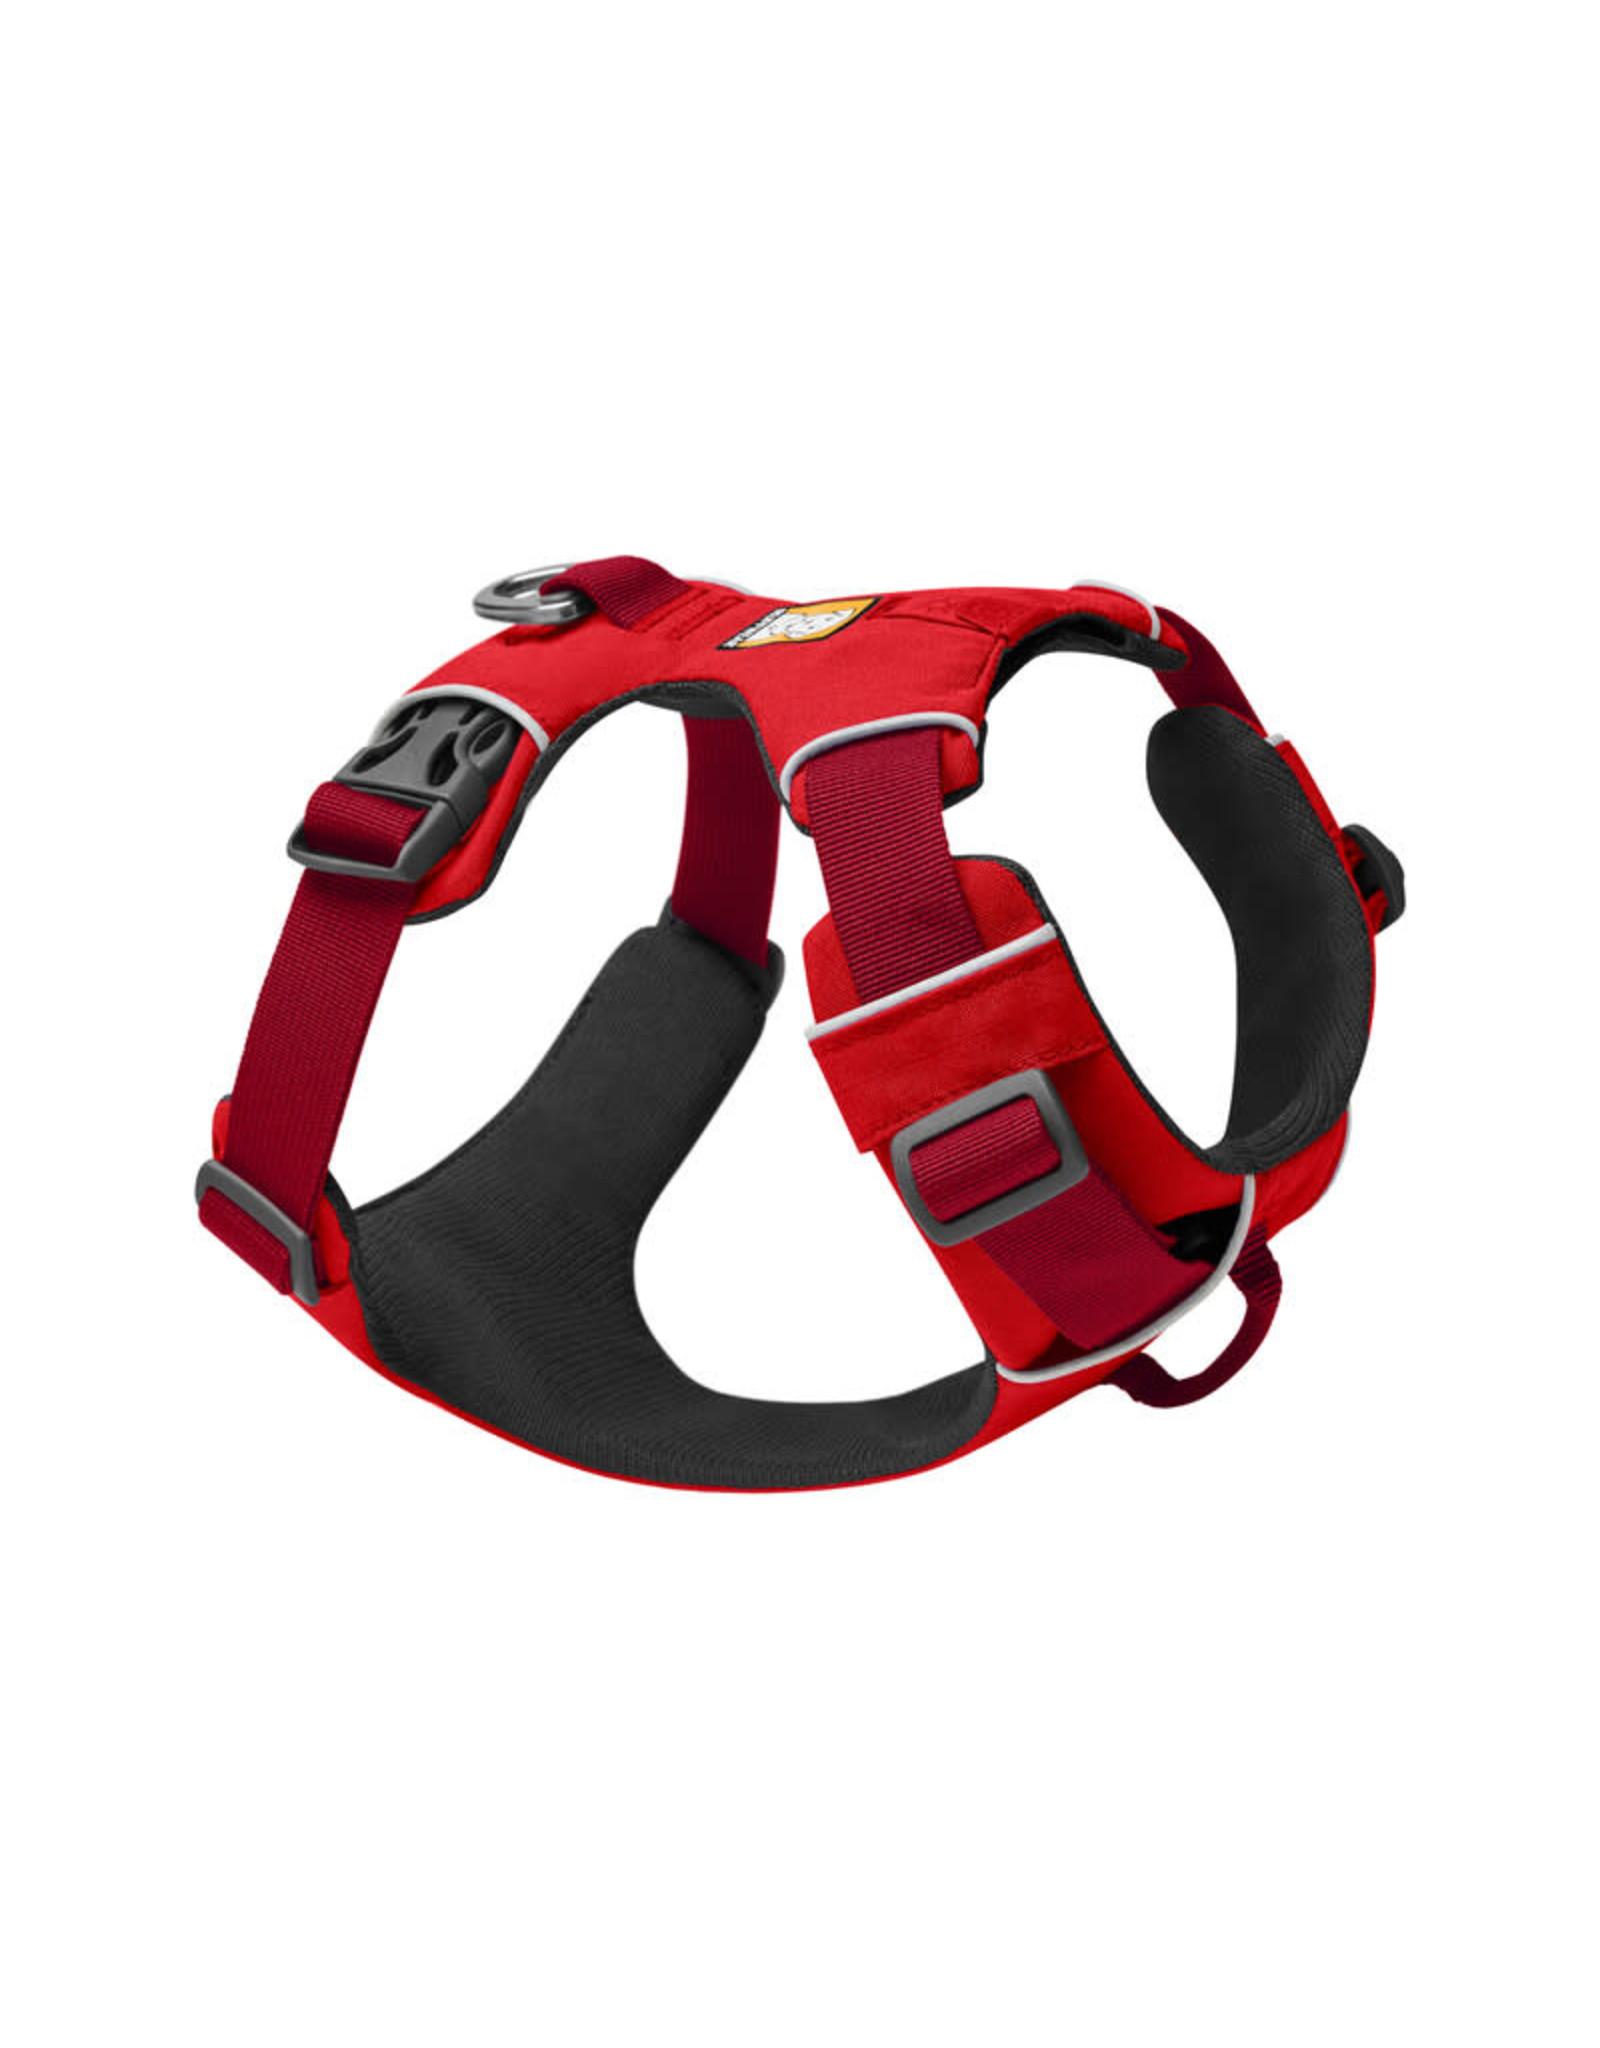 Ruffwear Front Range Harness: Red Sumac, XS